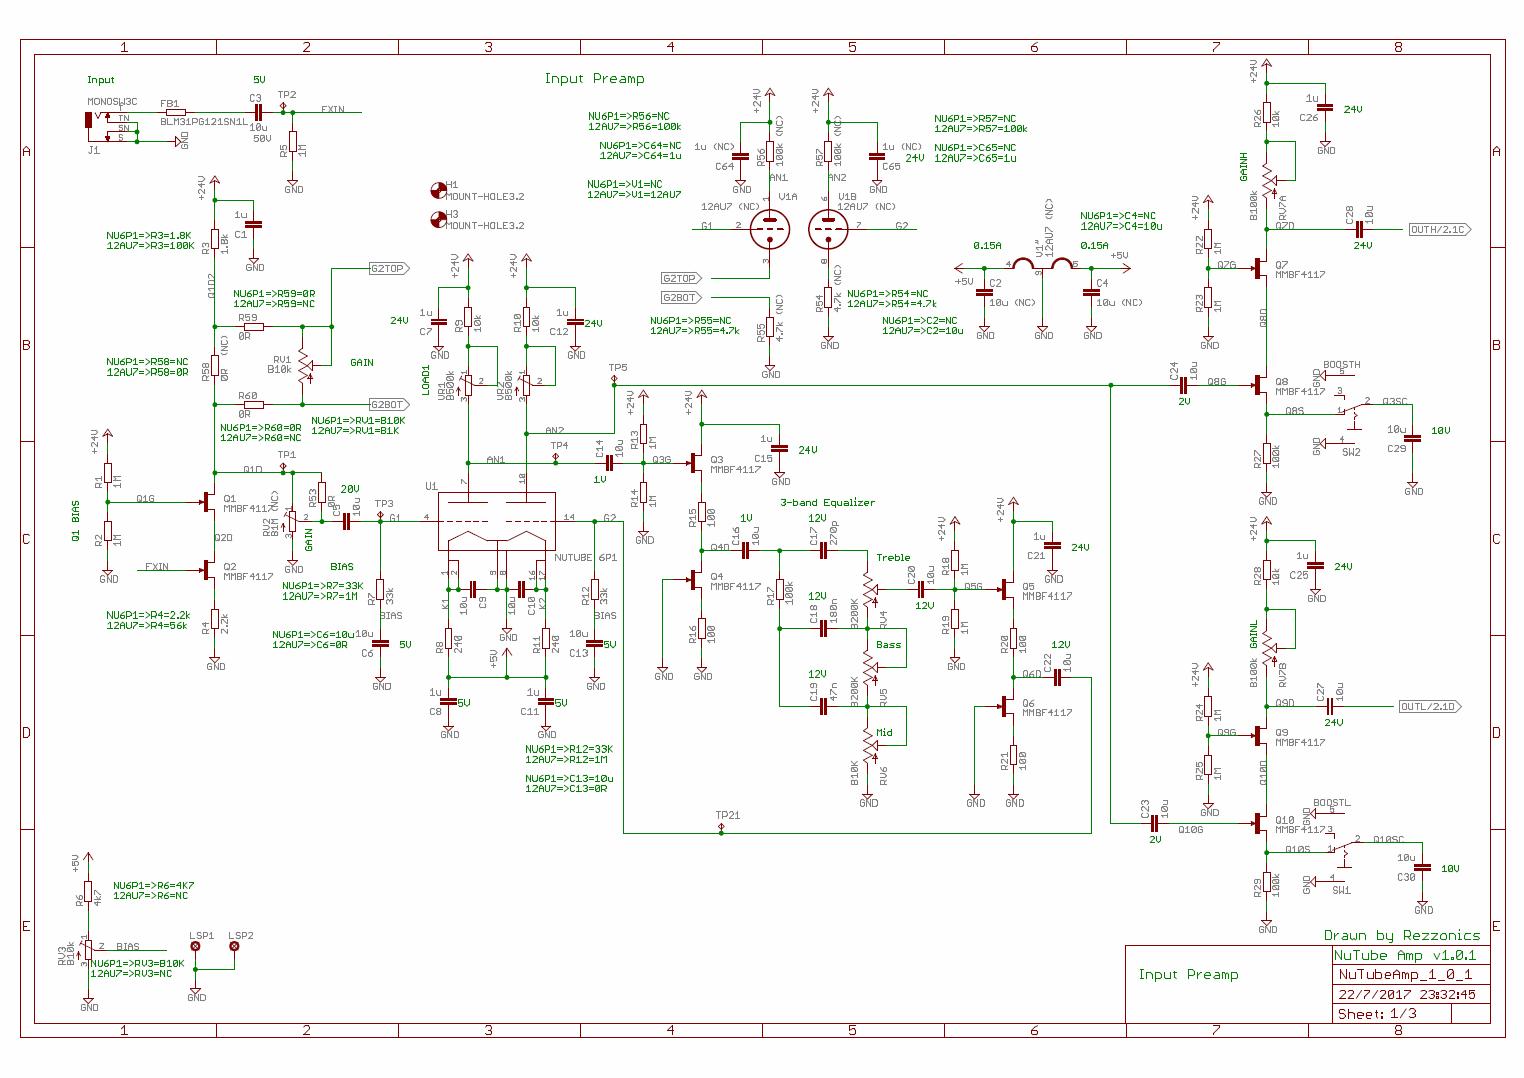 Rezzonics Korg Nutube 6p1 Vs 12ax7 Tube Hybrid Amplifier 3 Schematics Page 1 Input Preamp